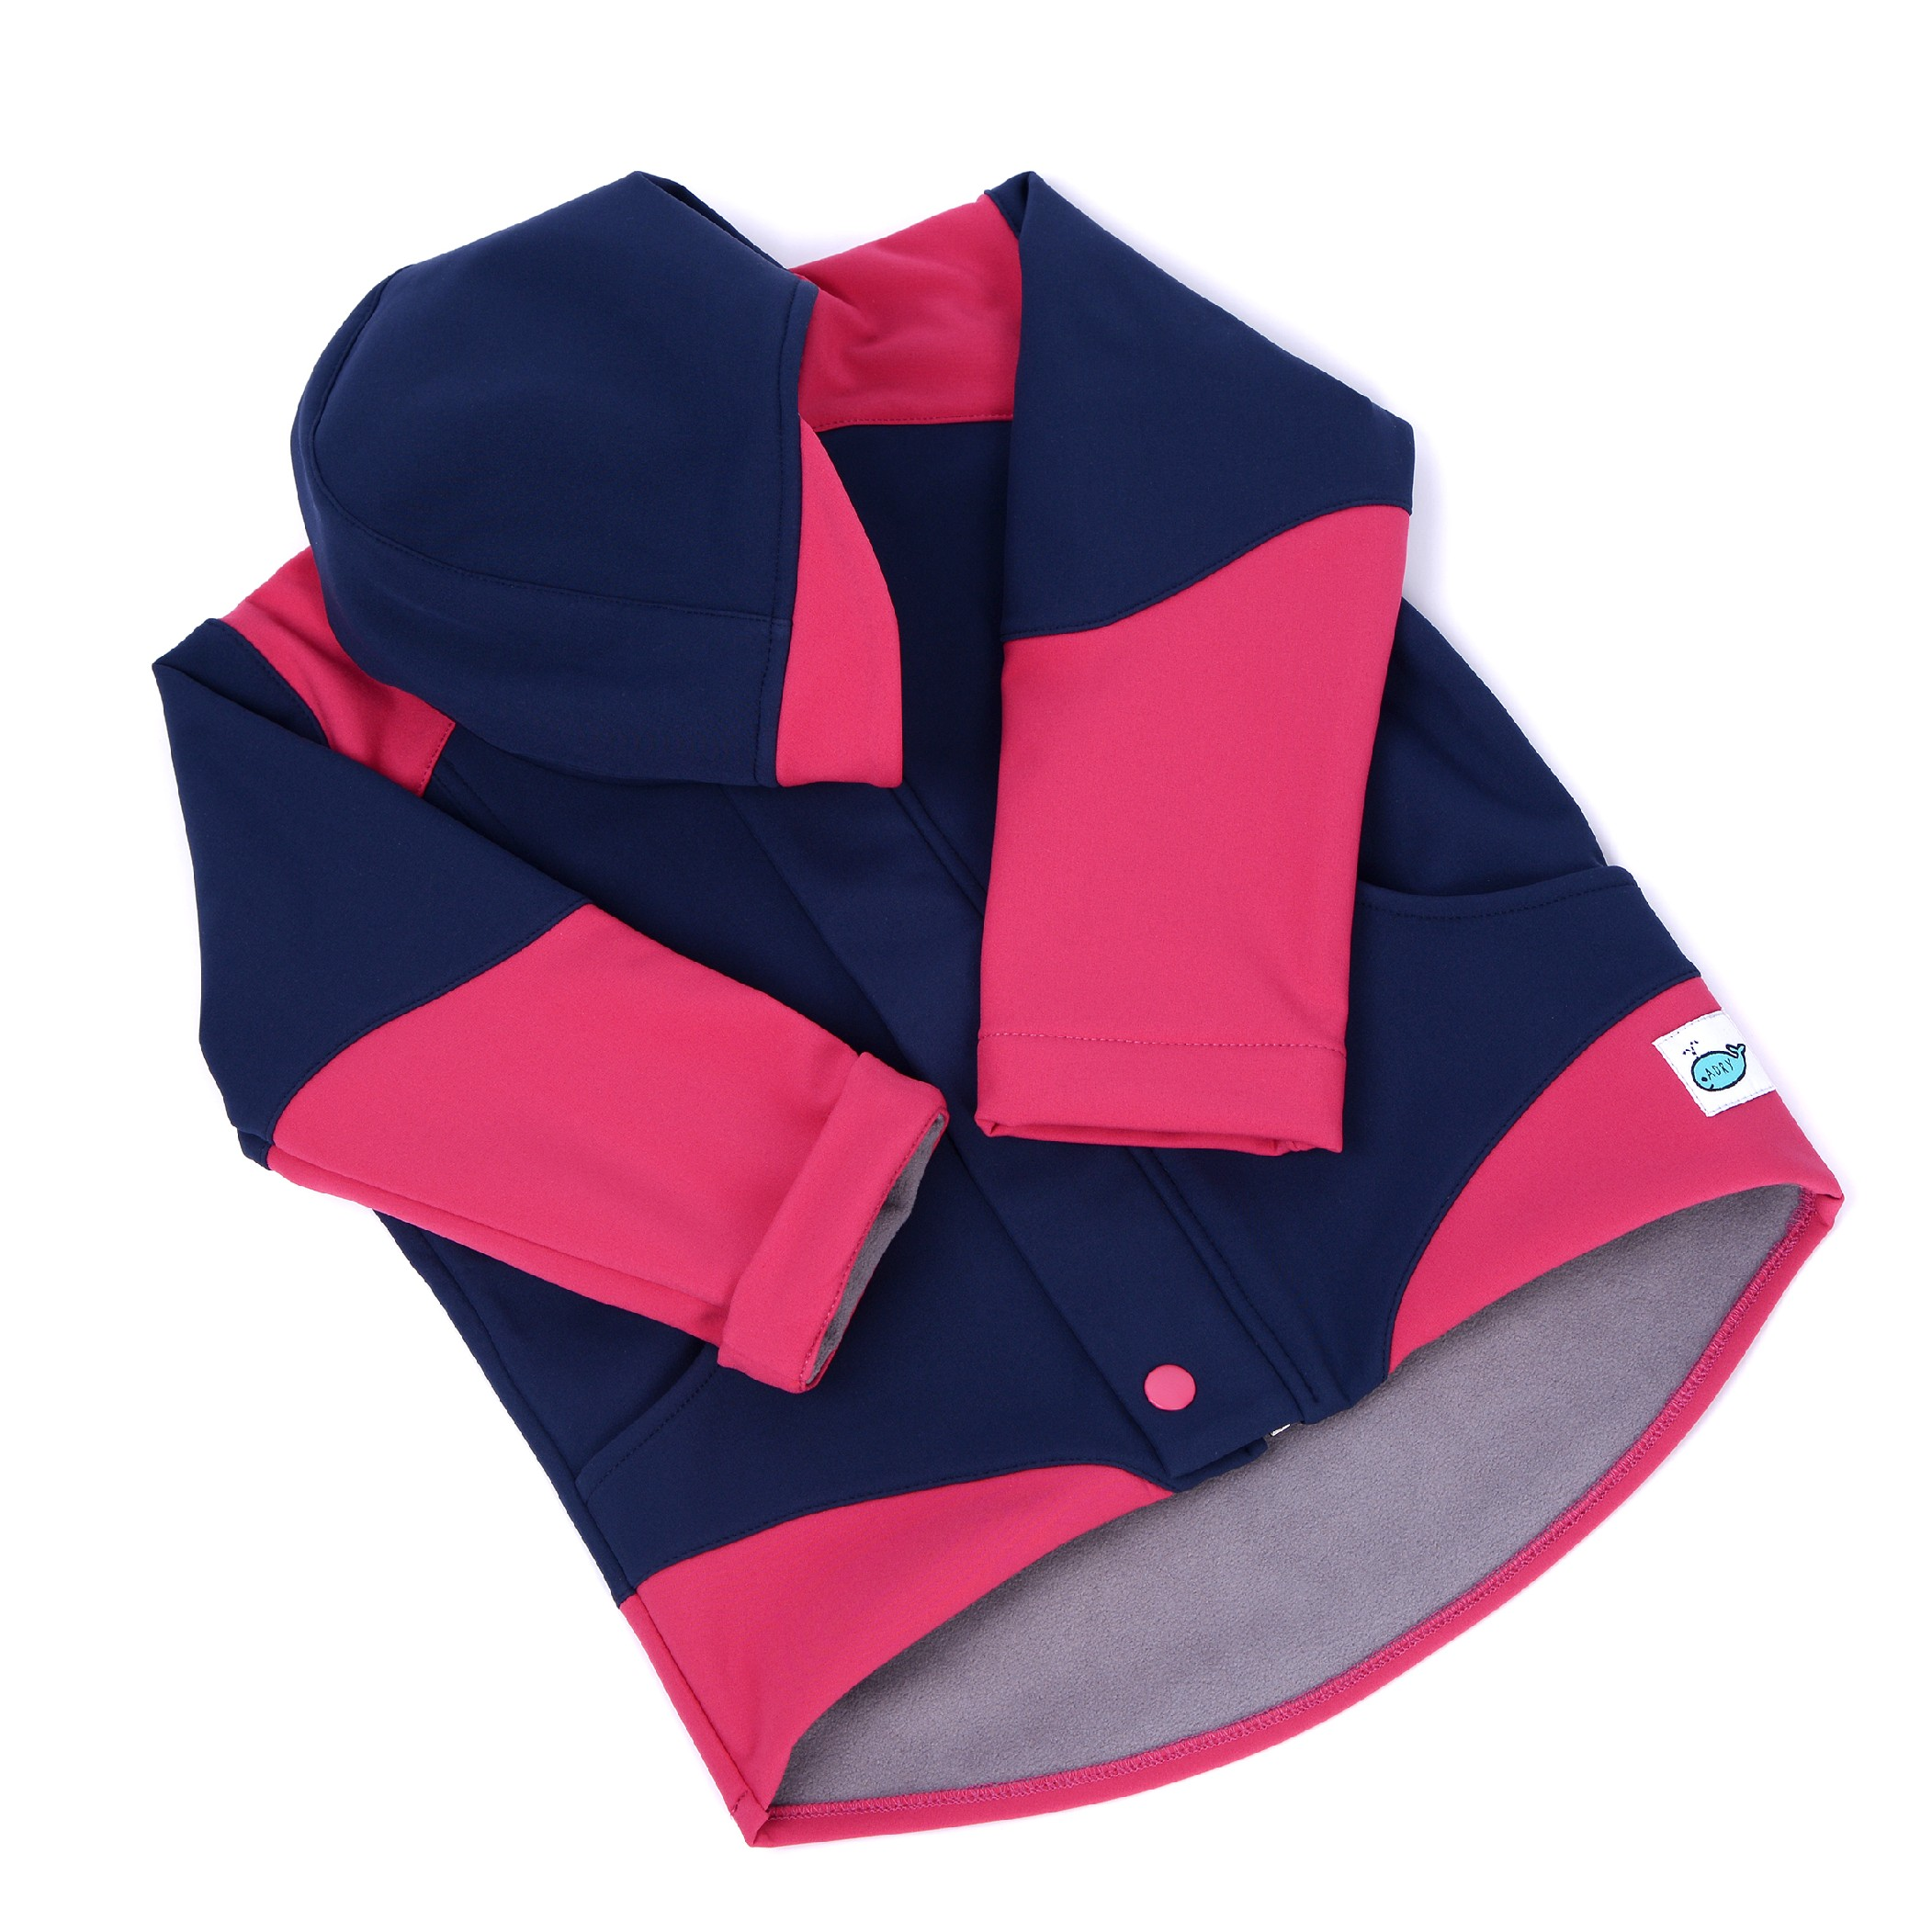 Dětská softshellová bunda ADRY Modrá/ružová Barva: Růžová, Velikost: 134